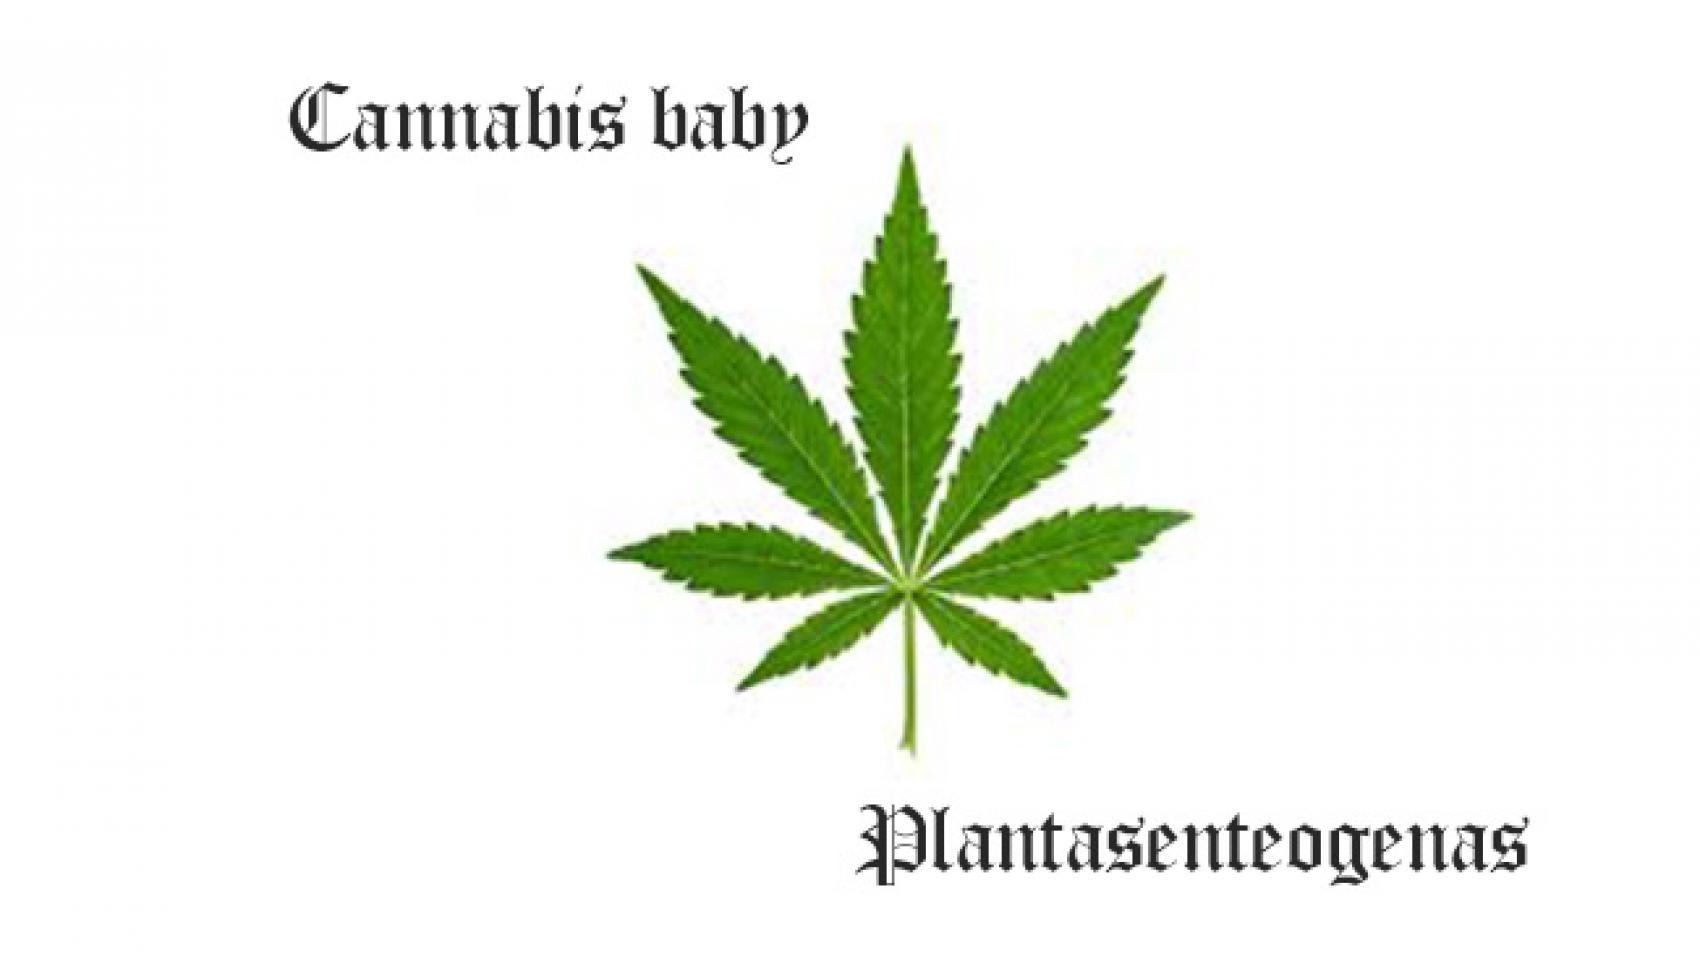 cannabis baby